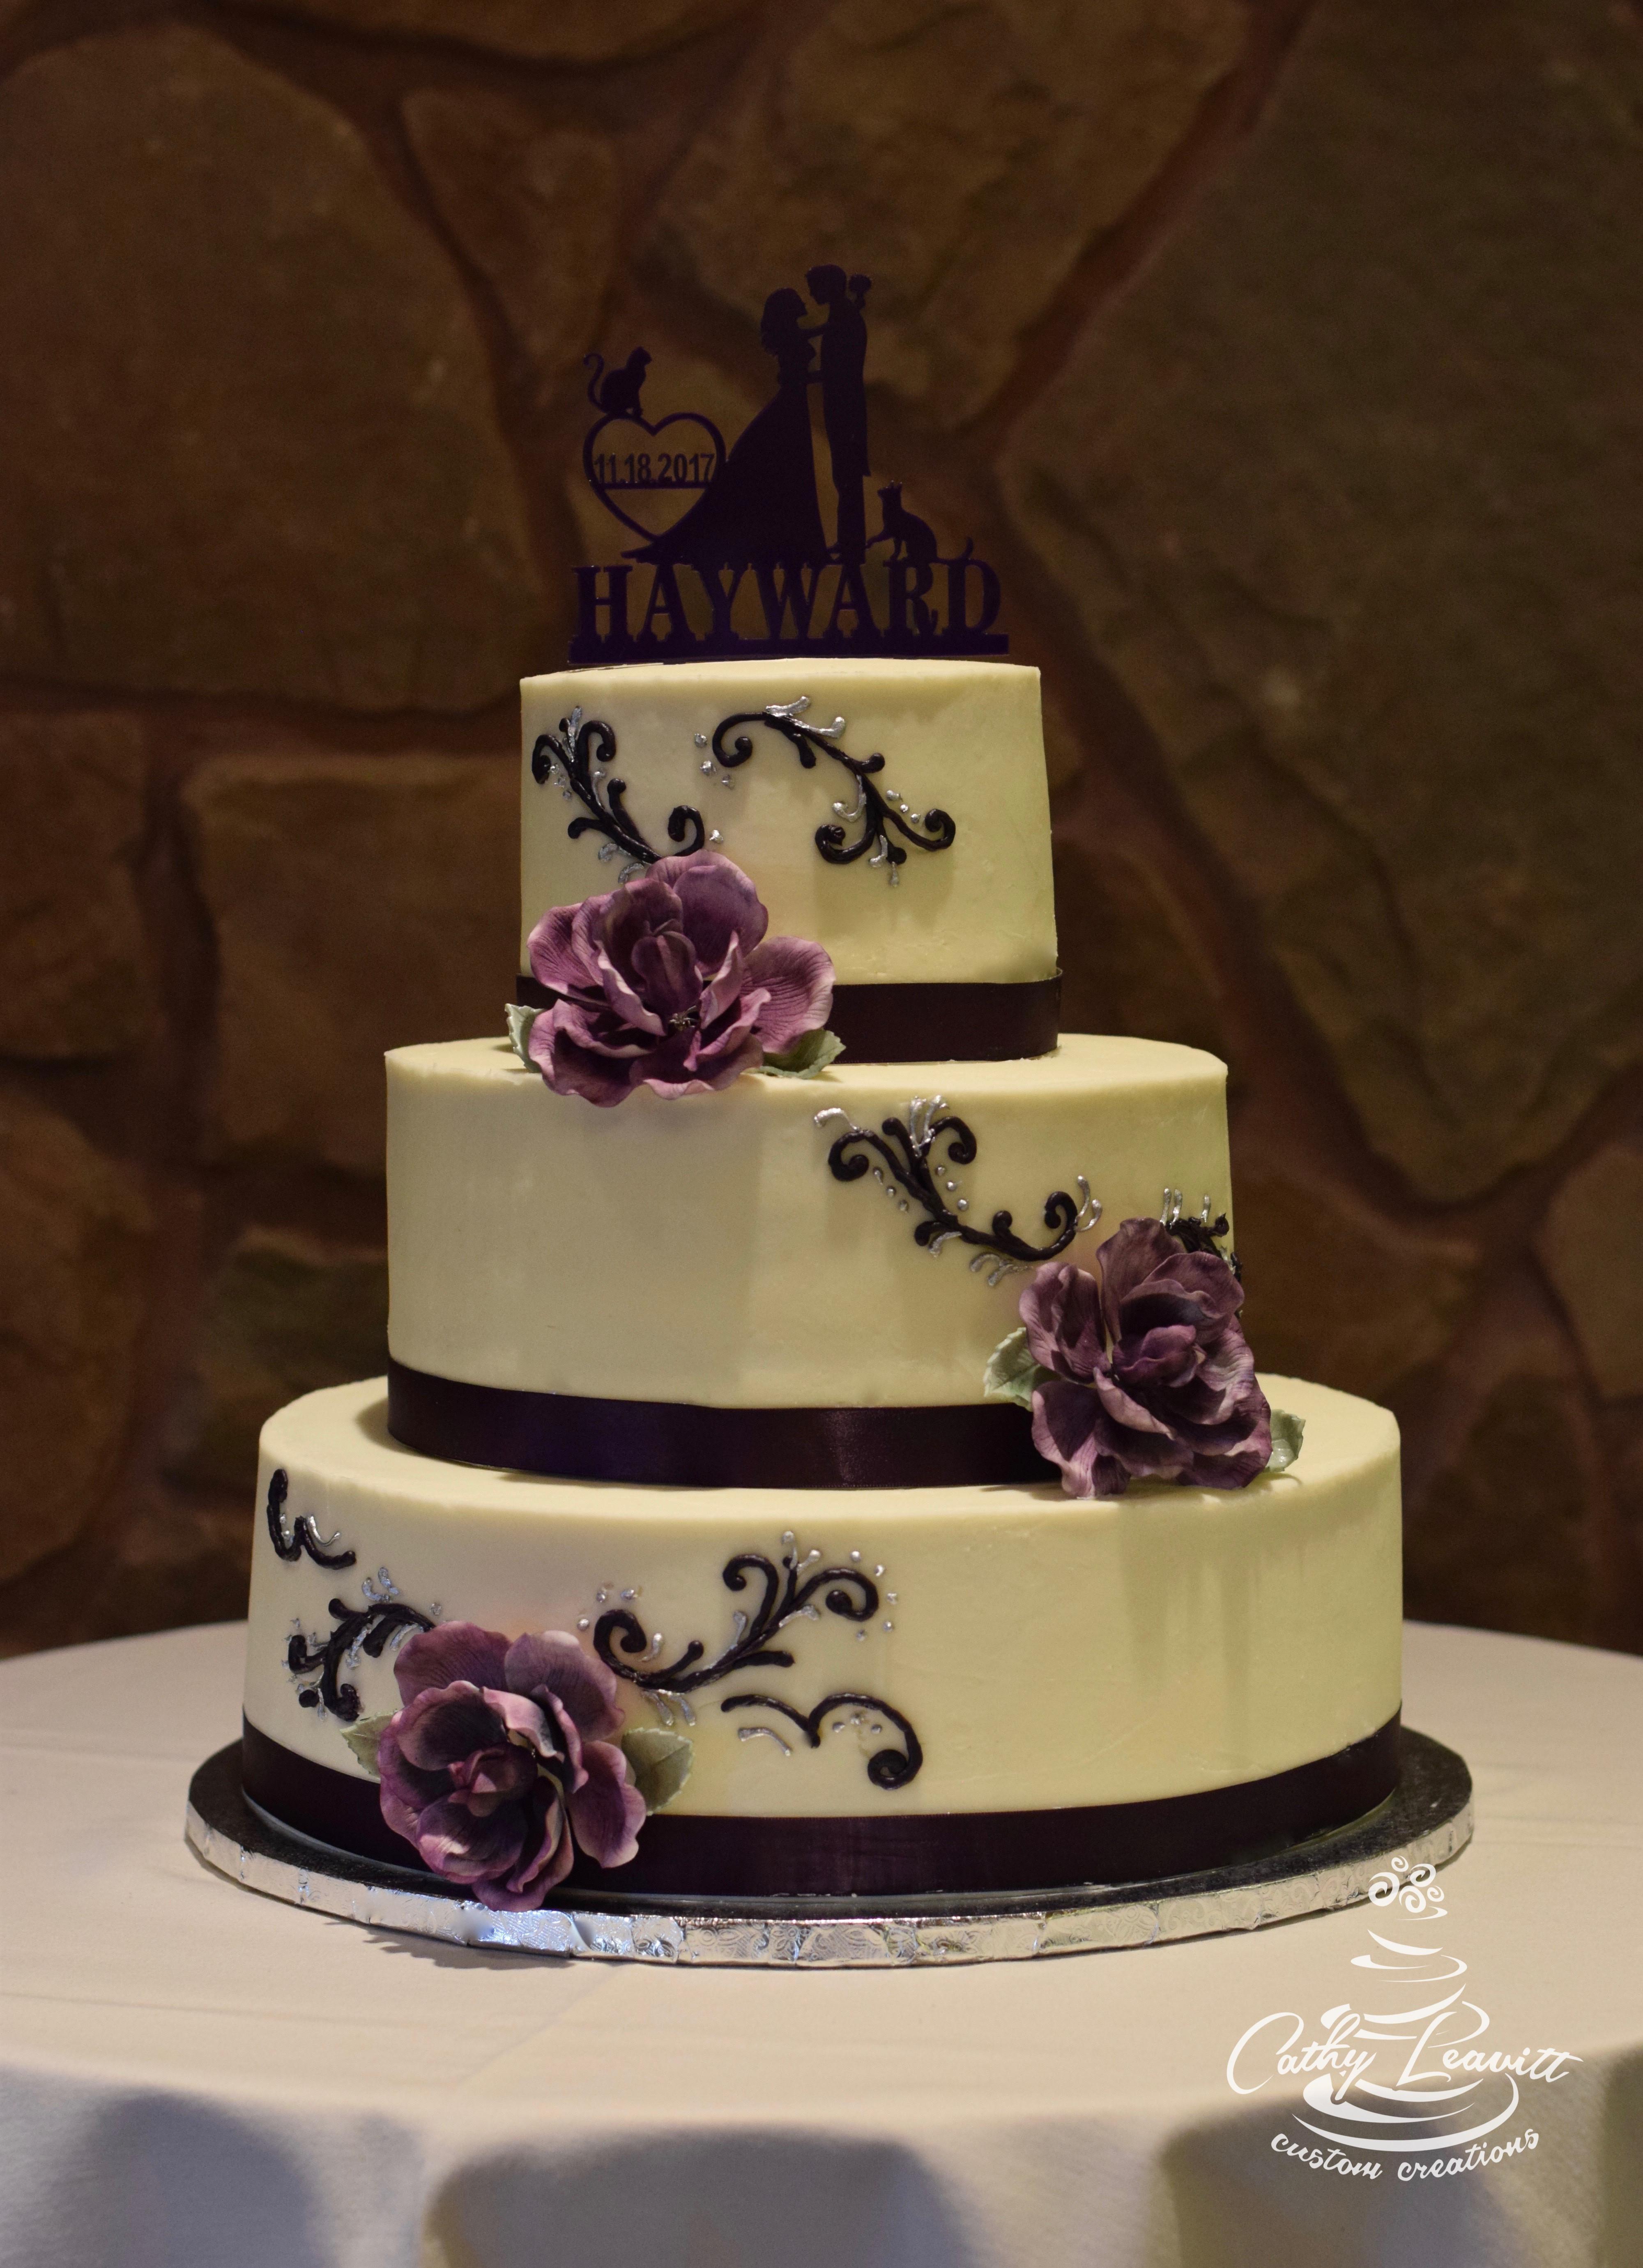 Wedding Cakes Colorado  Colorado Springs wedding cakes by Cathy Leavitt custom